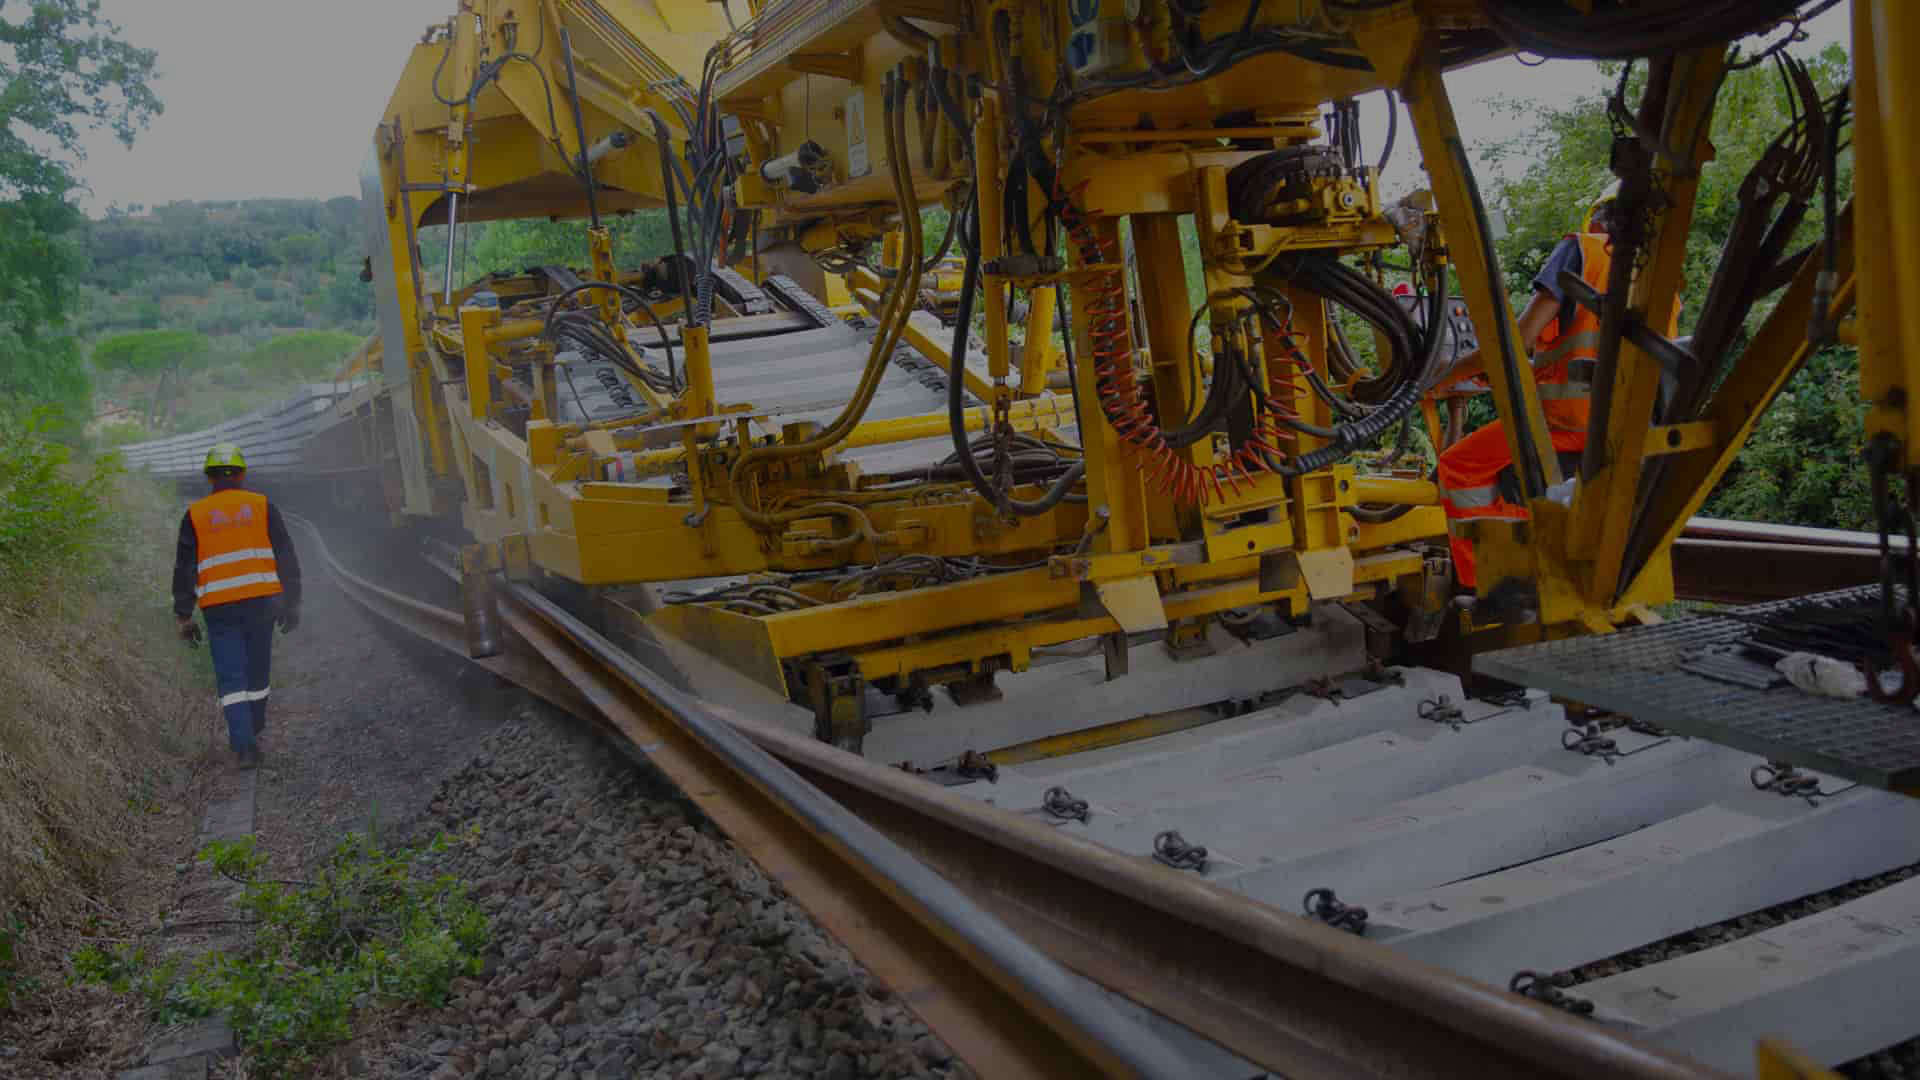 Rail Salcef track maintenance